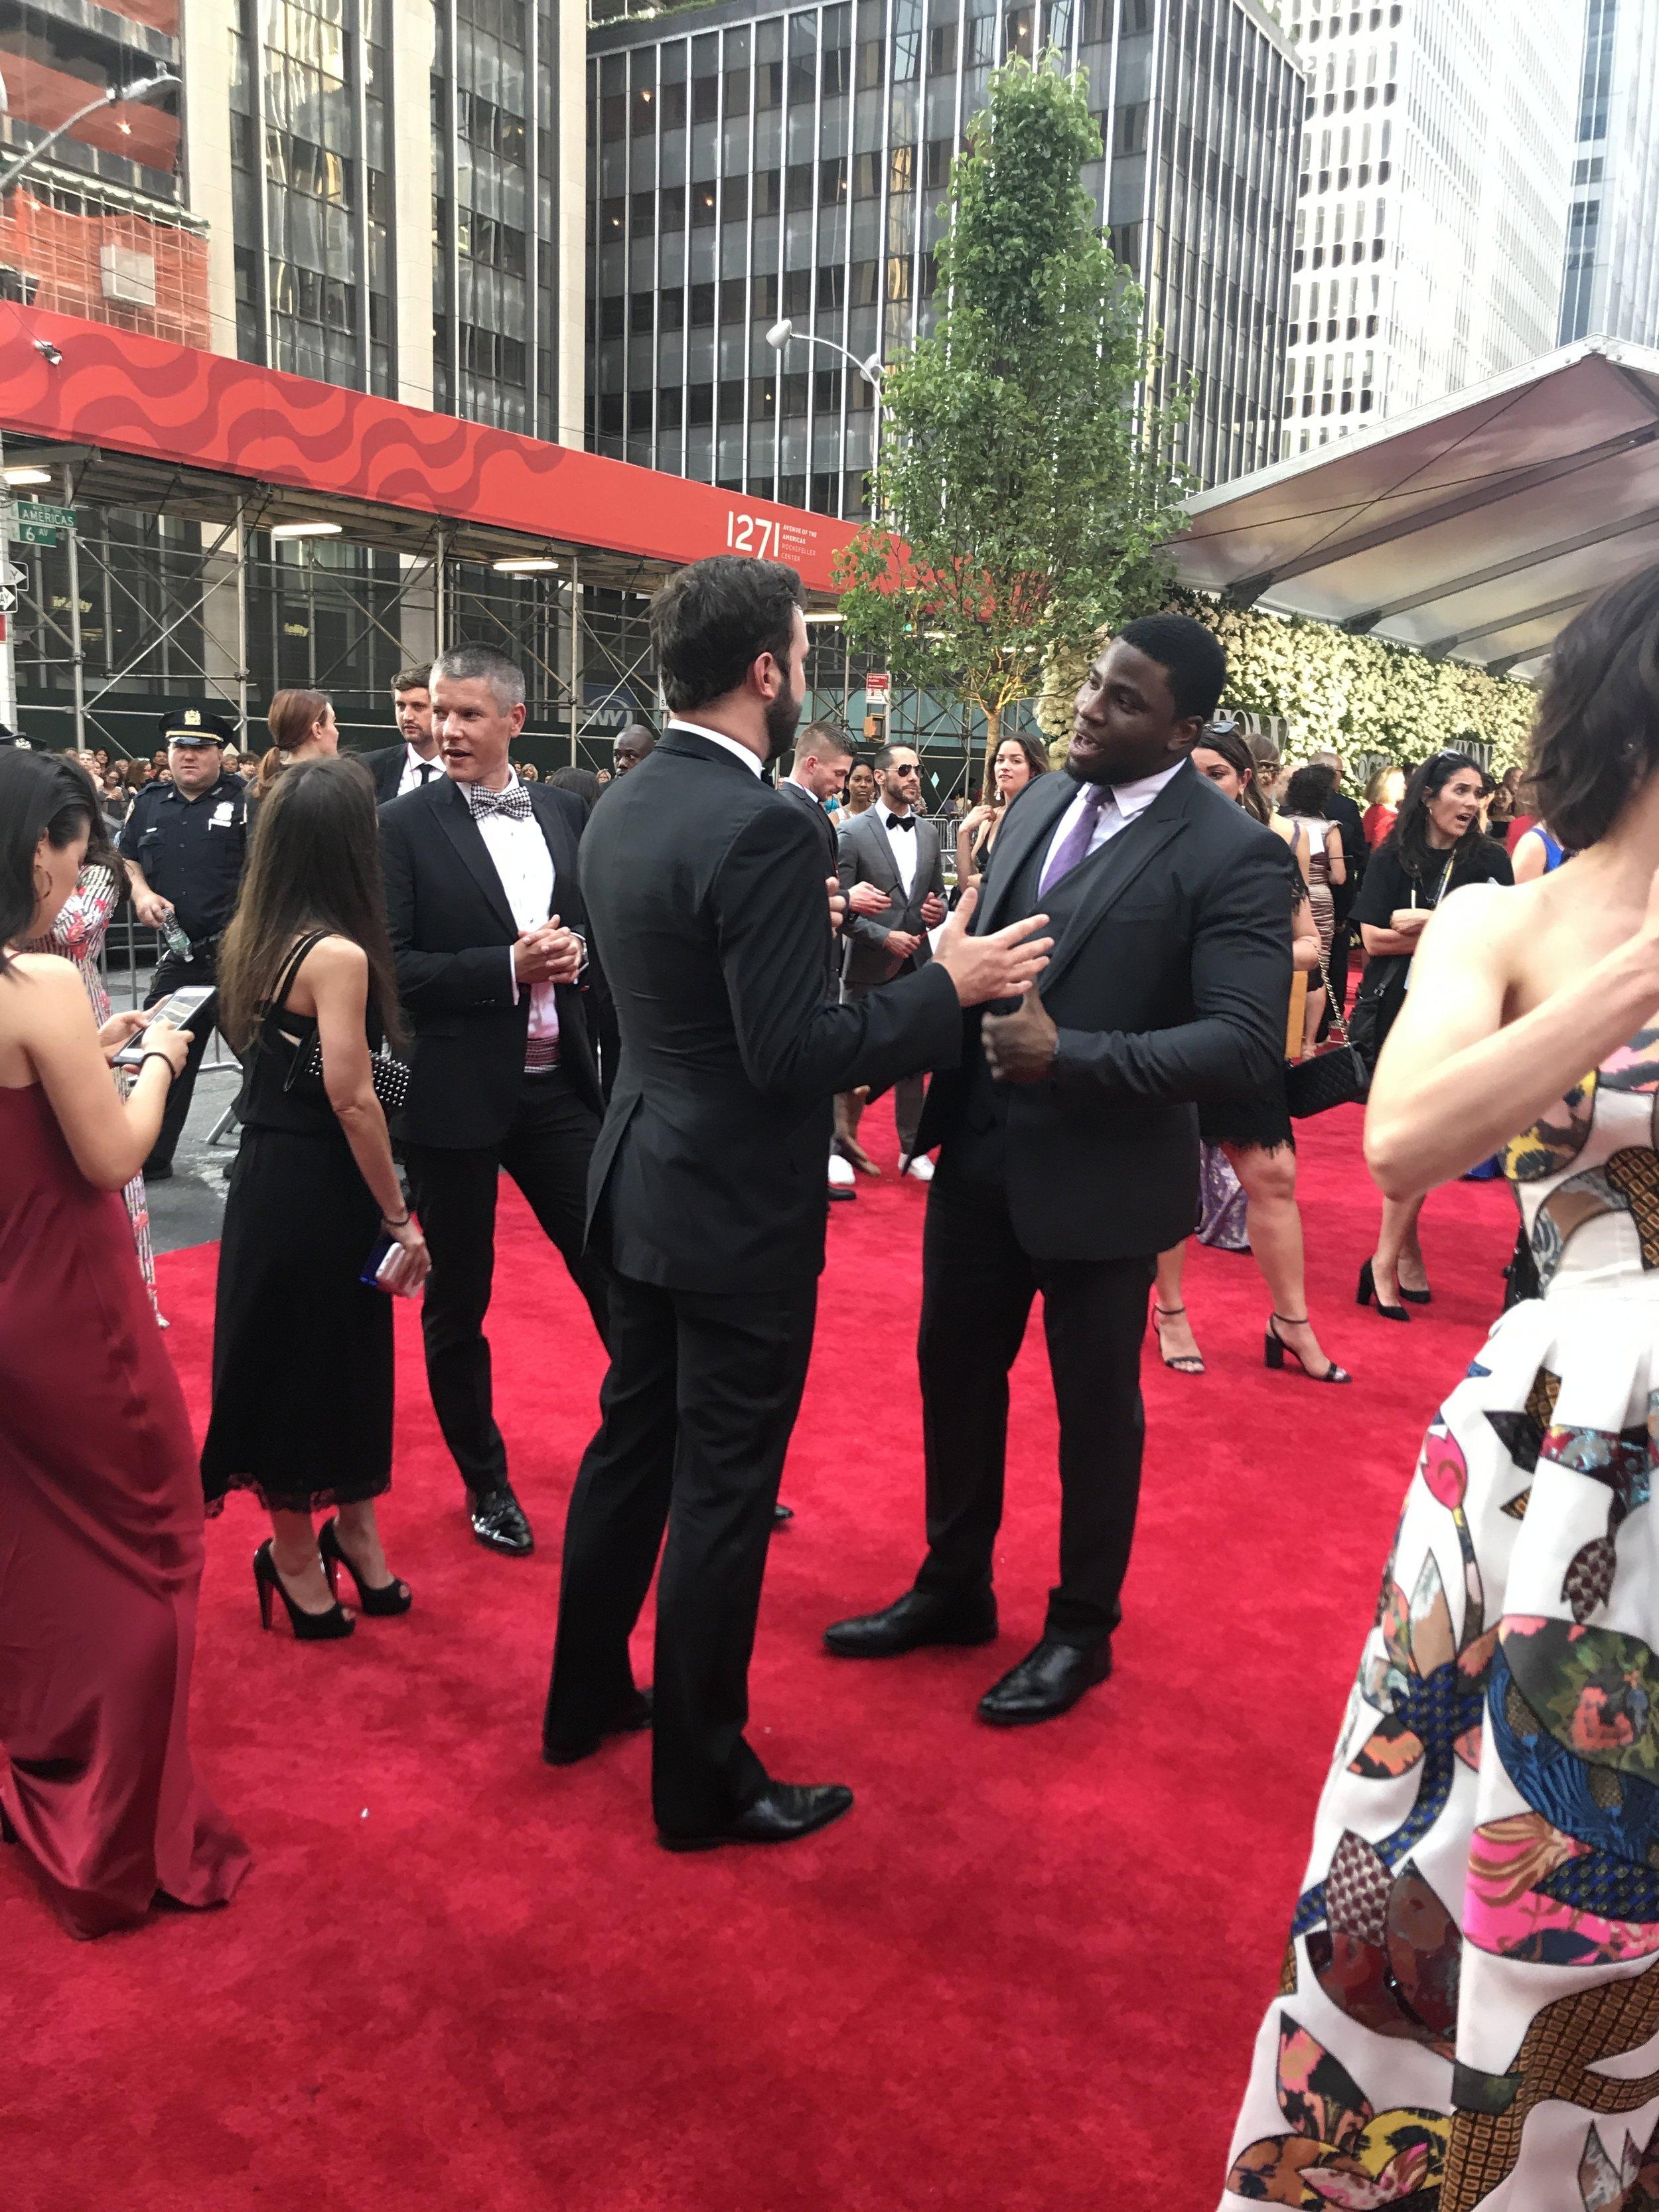 Hamilton  co-stars Okieriete Onaodowan and Taran Killam chat on the red carpet.